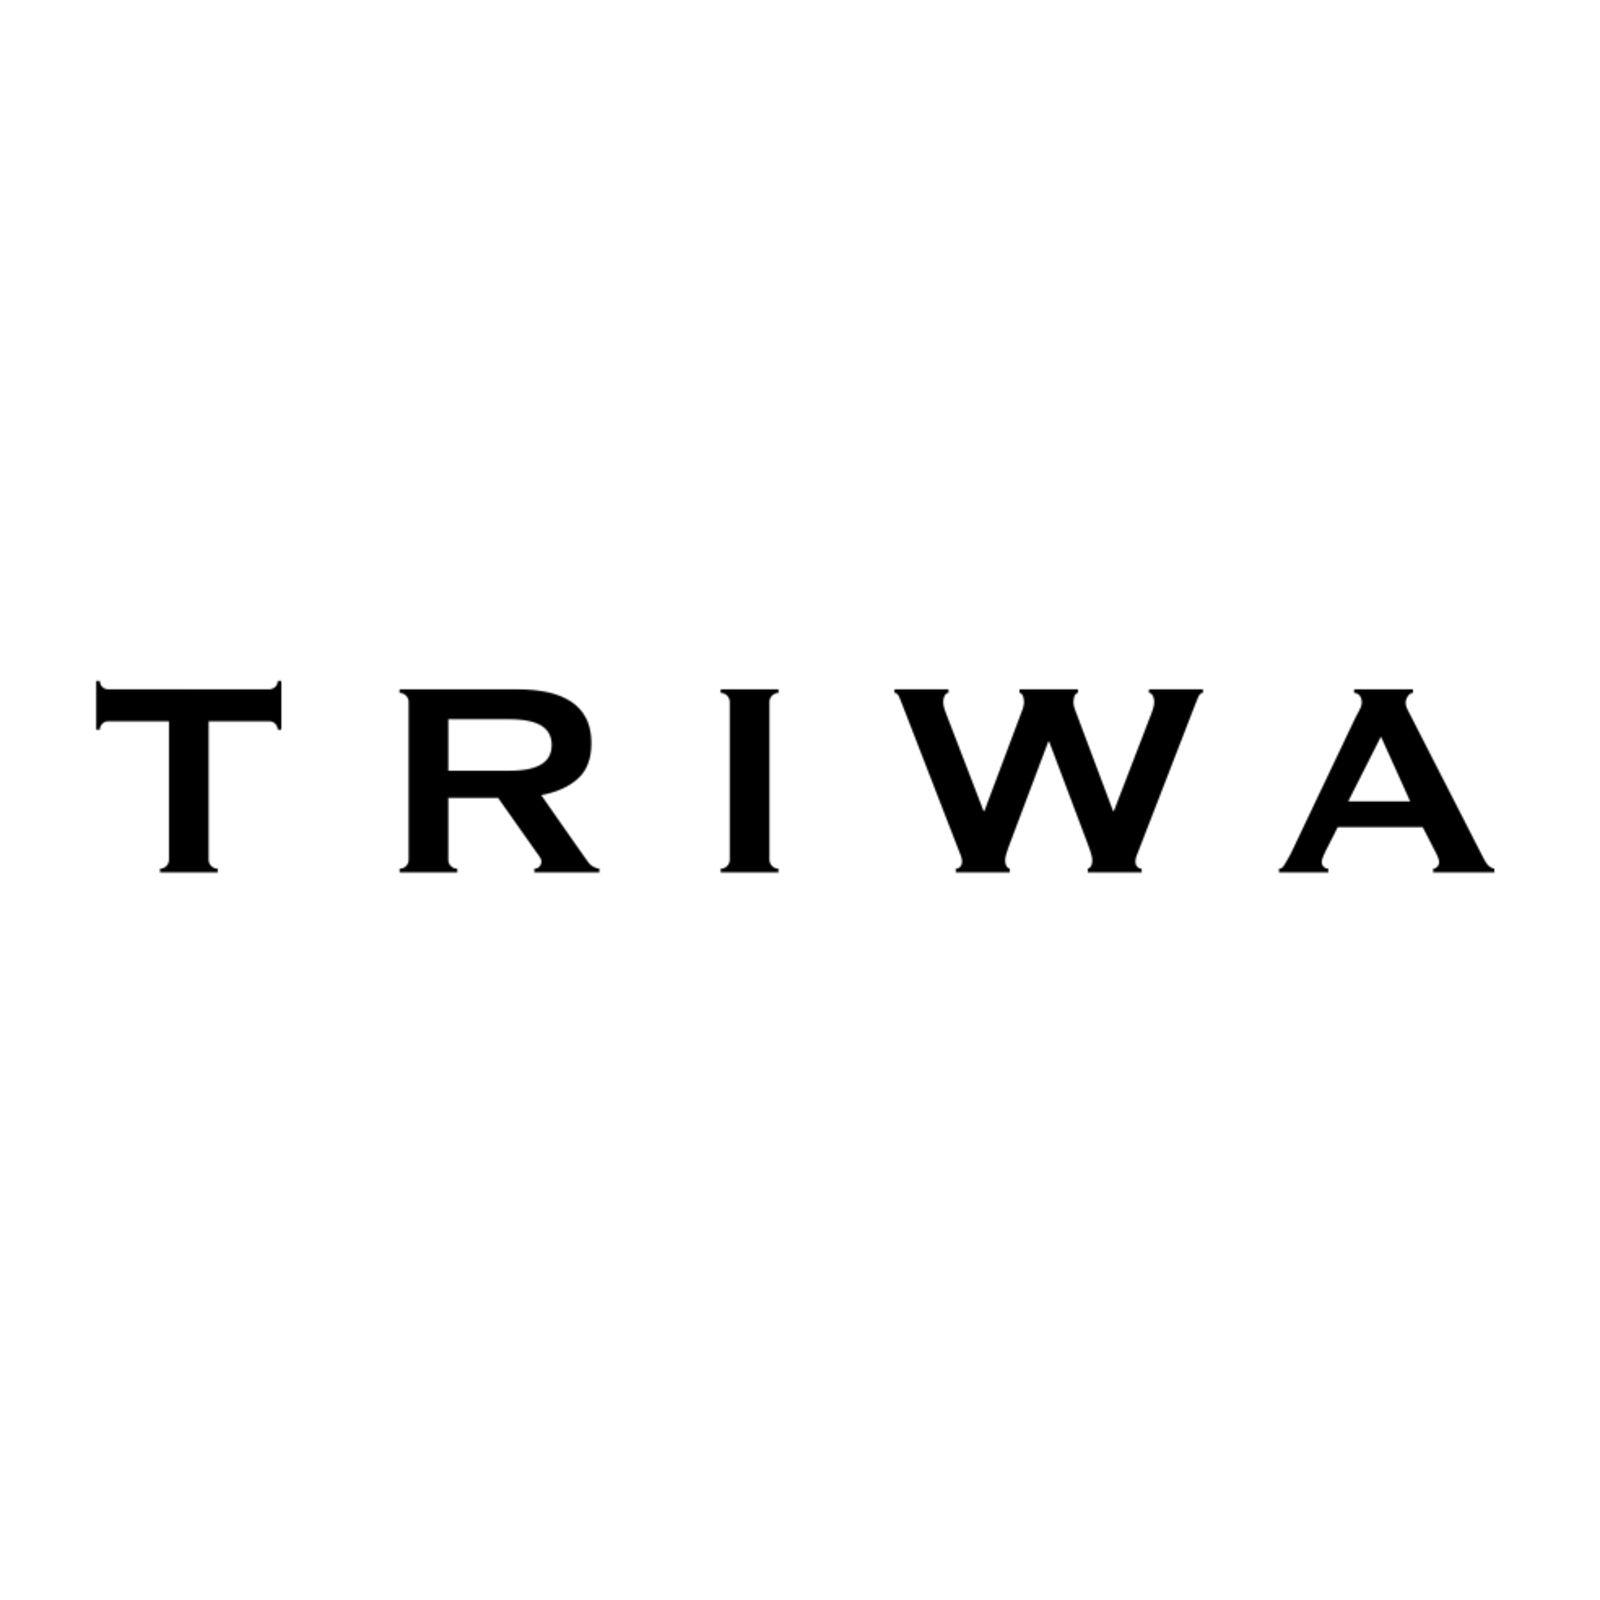 TRIWA (Bild 1)